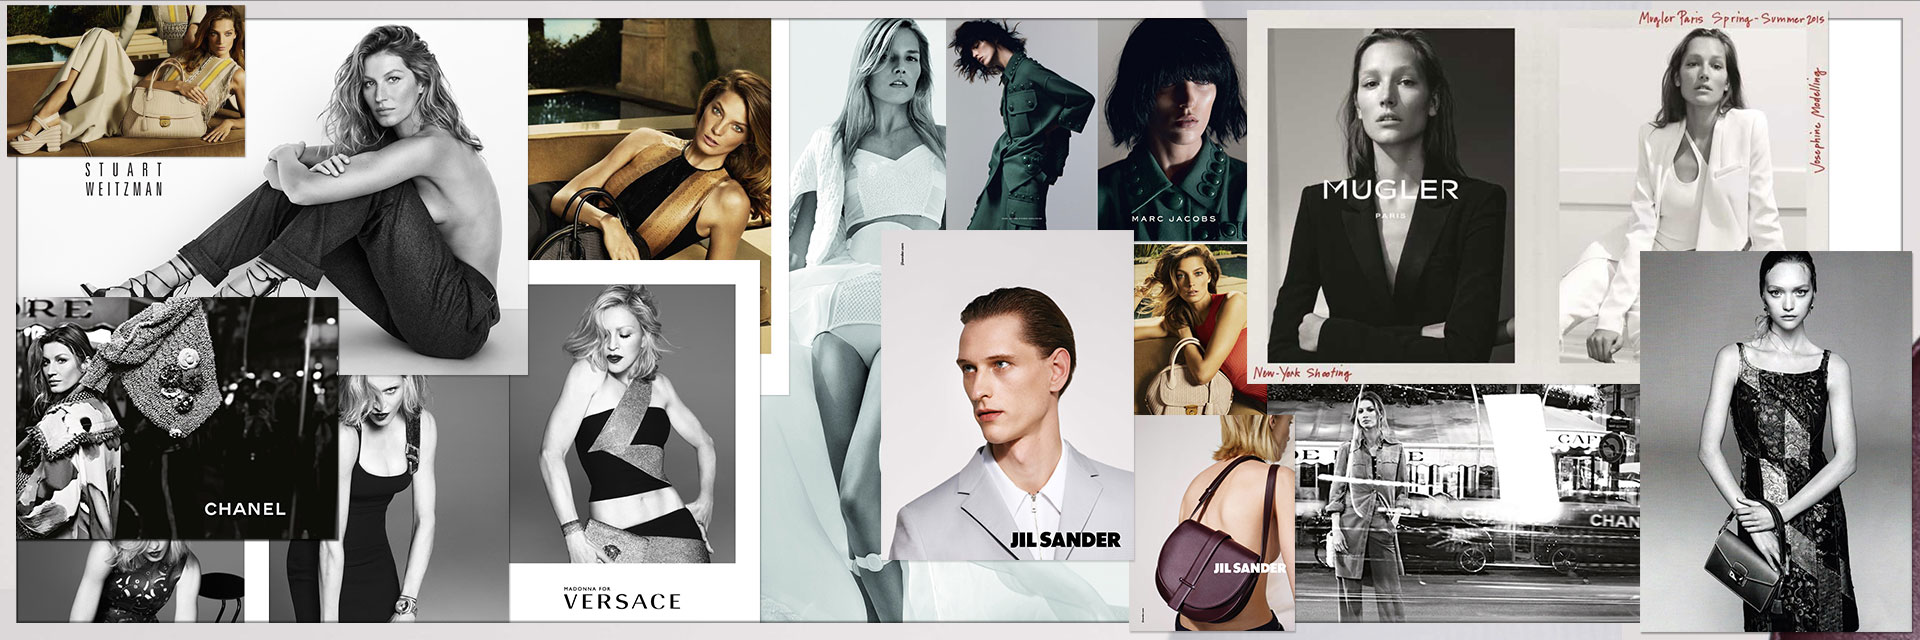 Fashion Campagne Wide